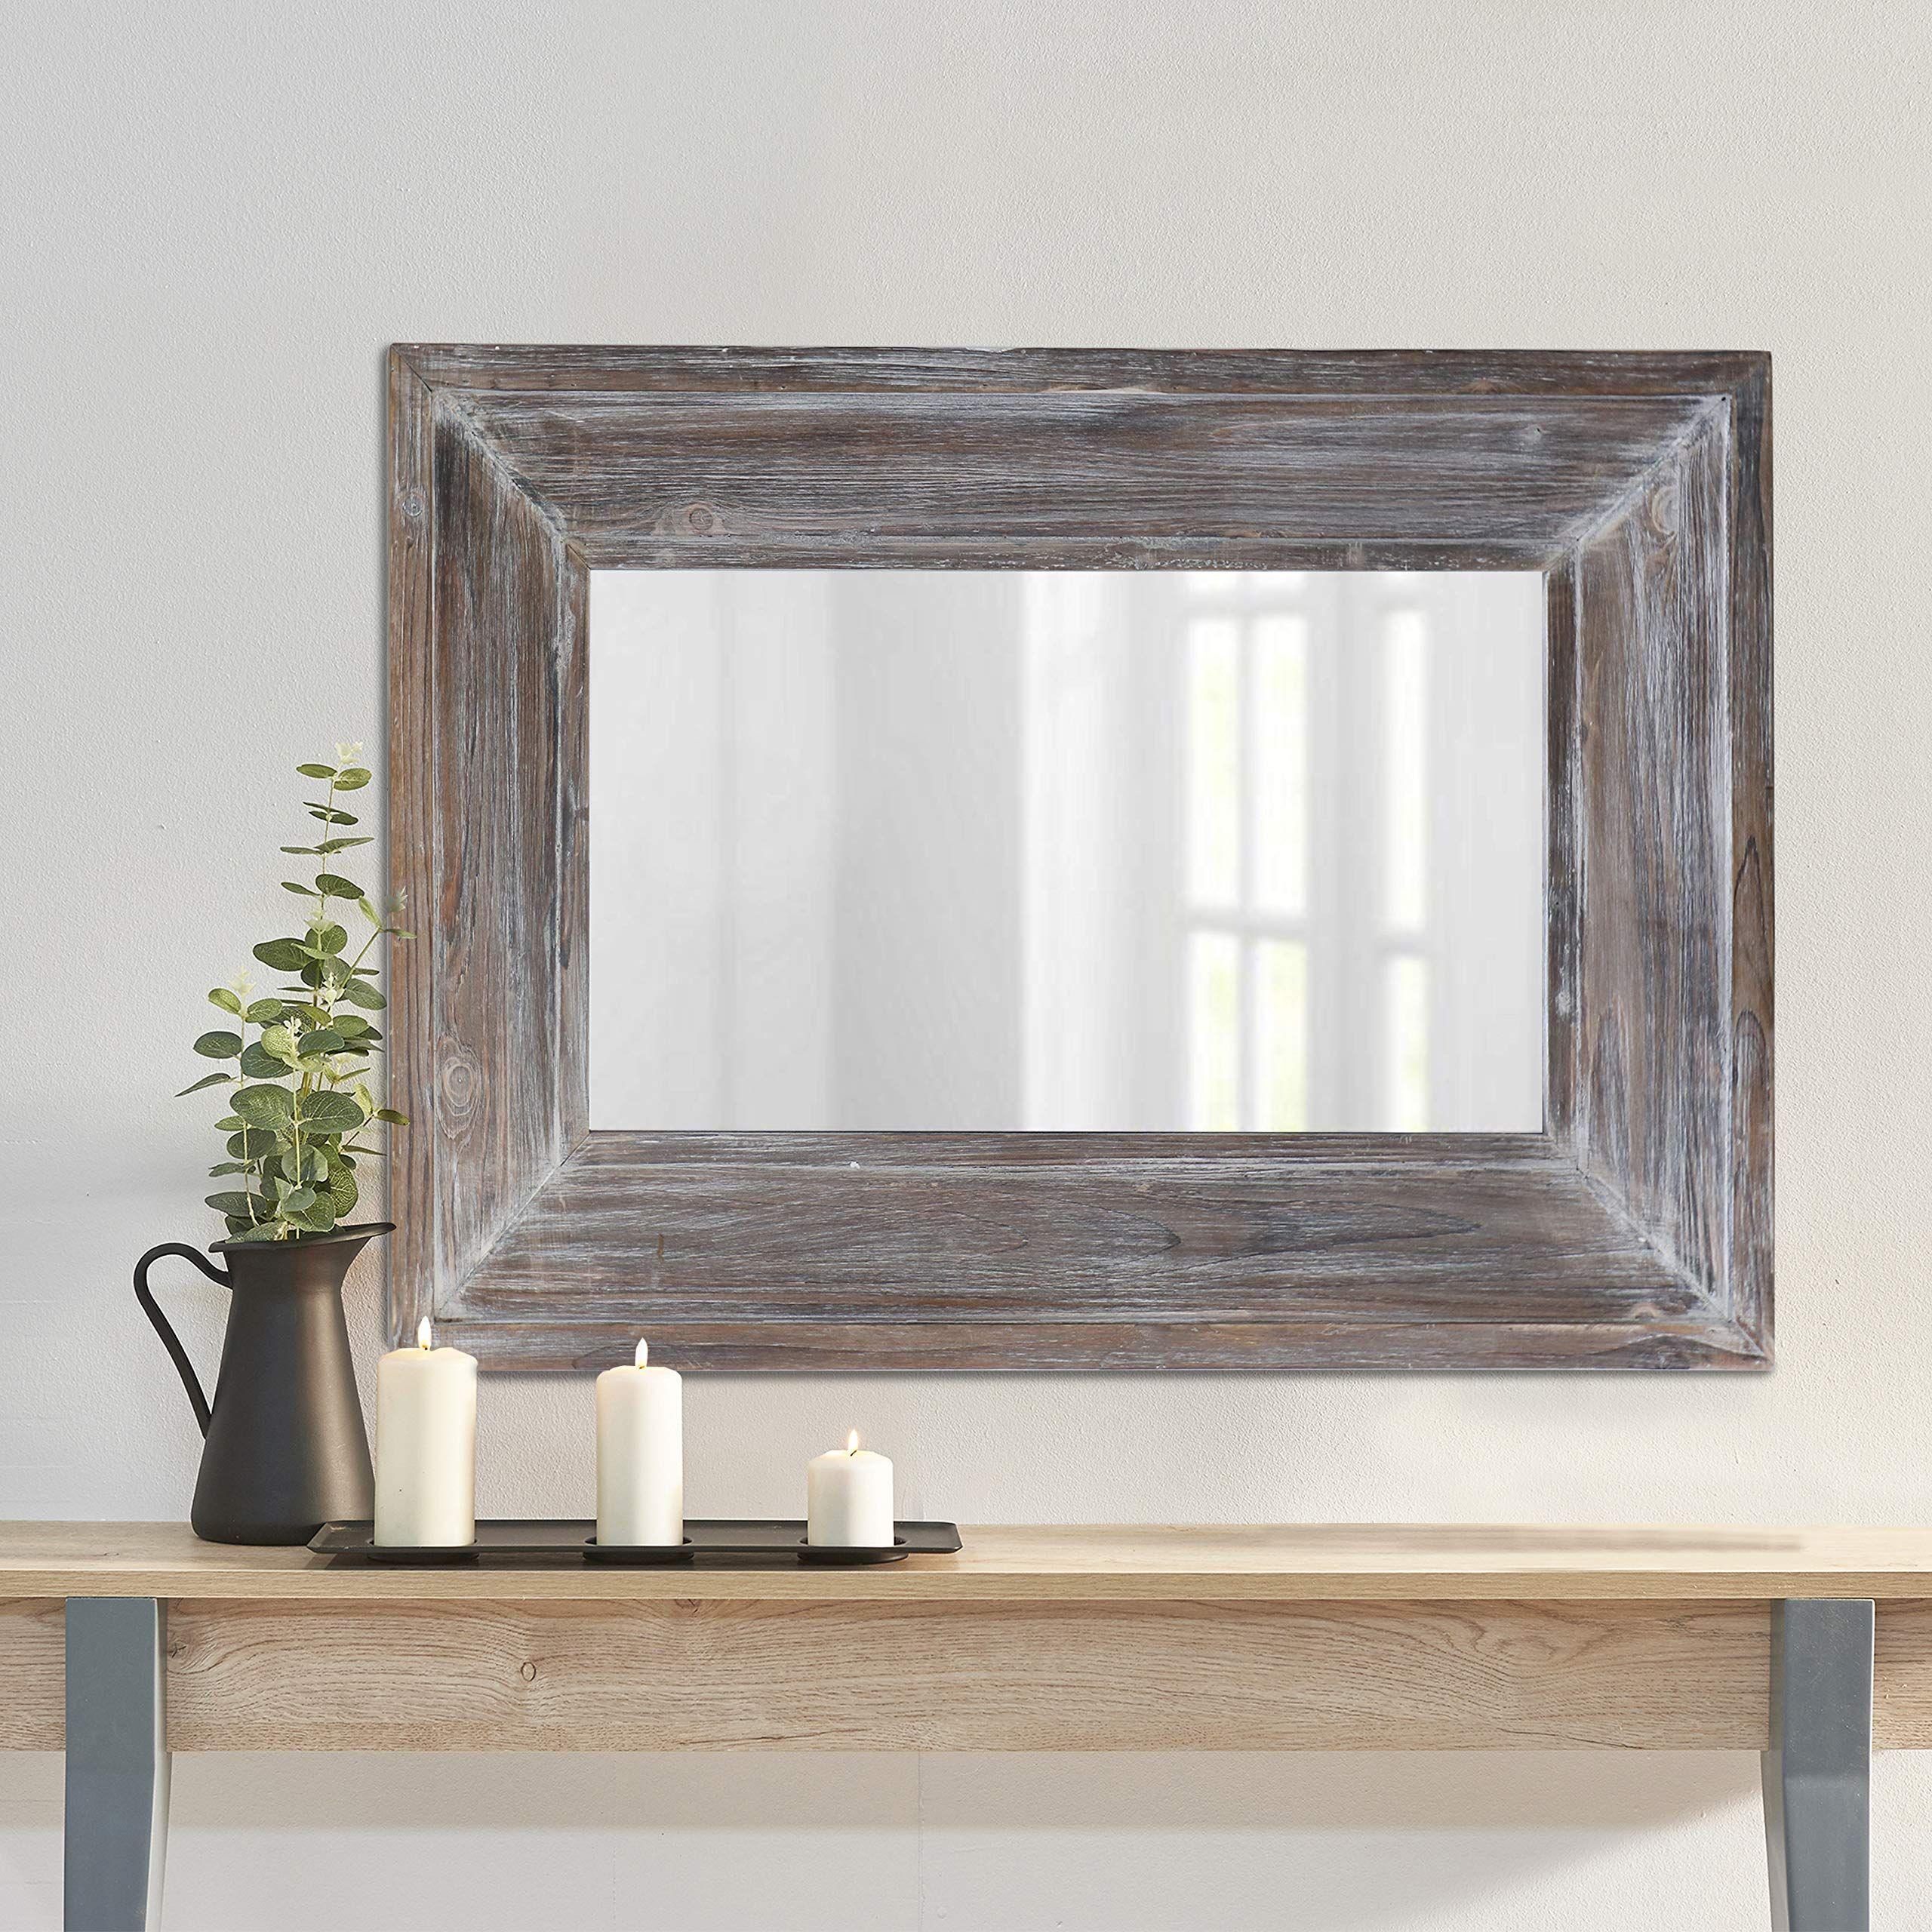 Barnyard Designs Decorative Wall Mirror Rustic Distressed Natural Wood Frame Vertical Hanging Mirror W In 2020 Large Rustic Wall Decor Rustic Mirrors Rustic Wall Decor